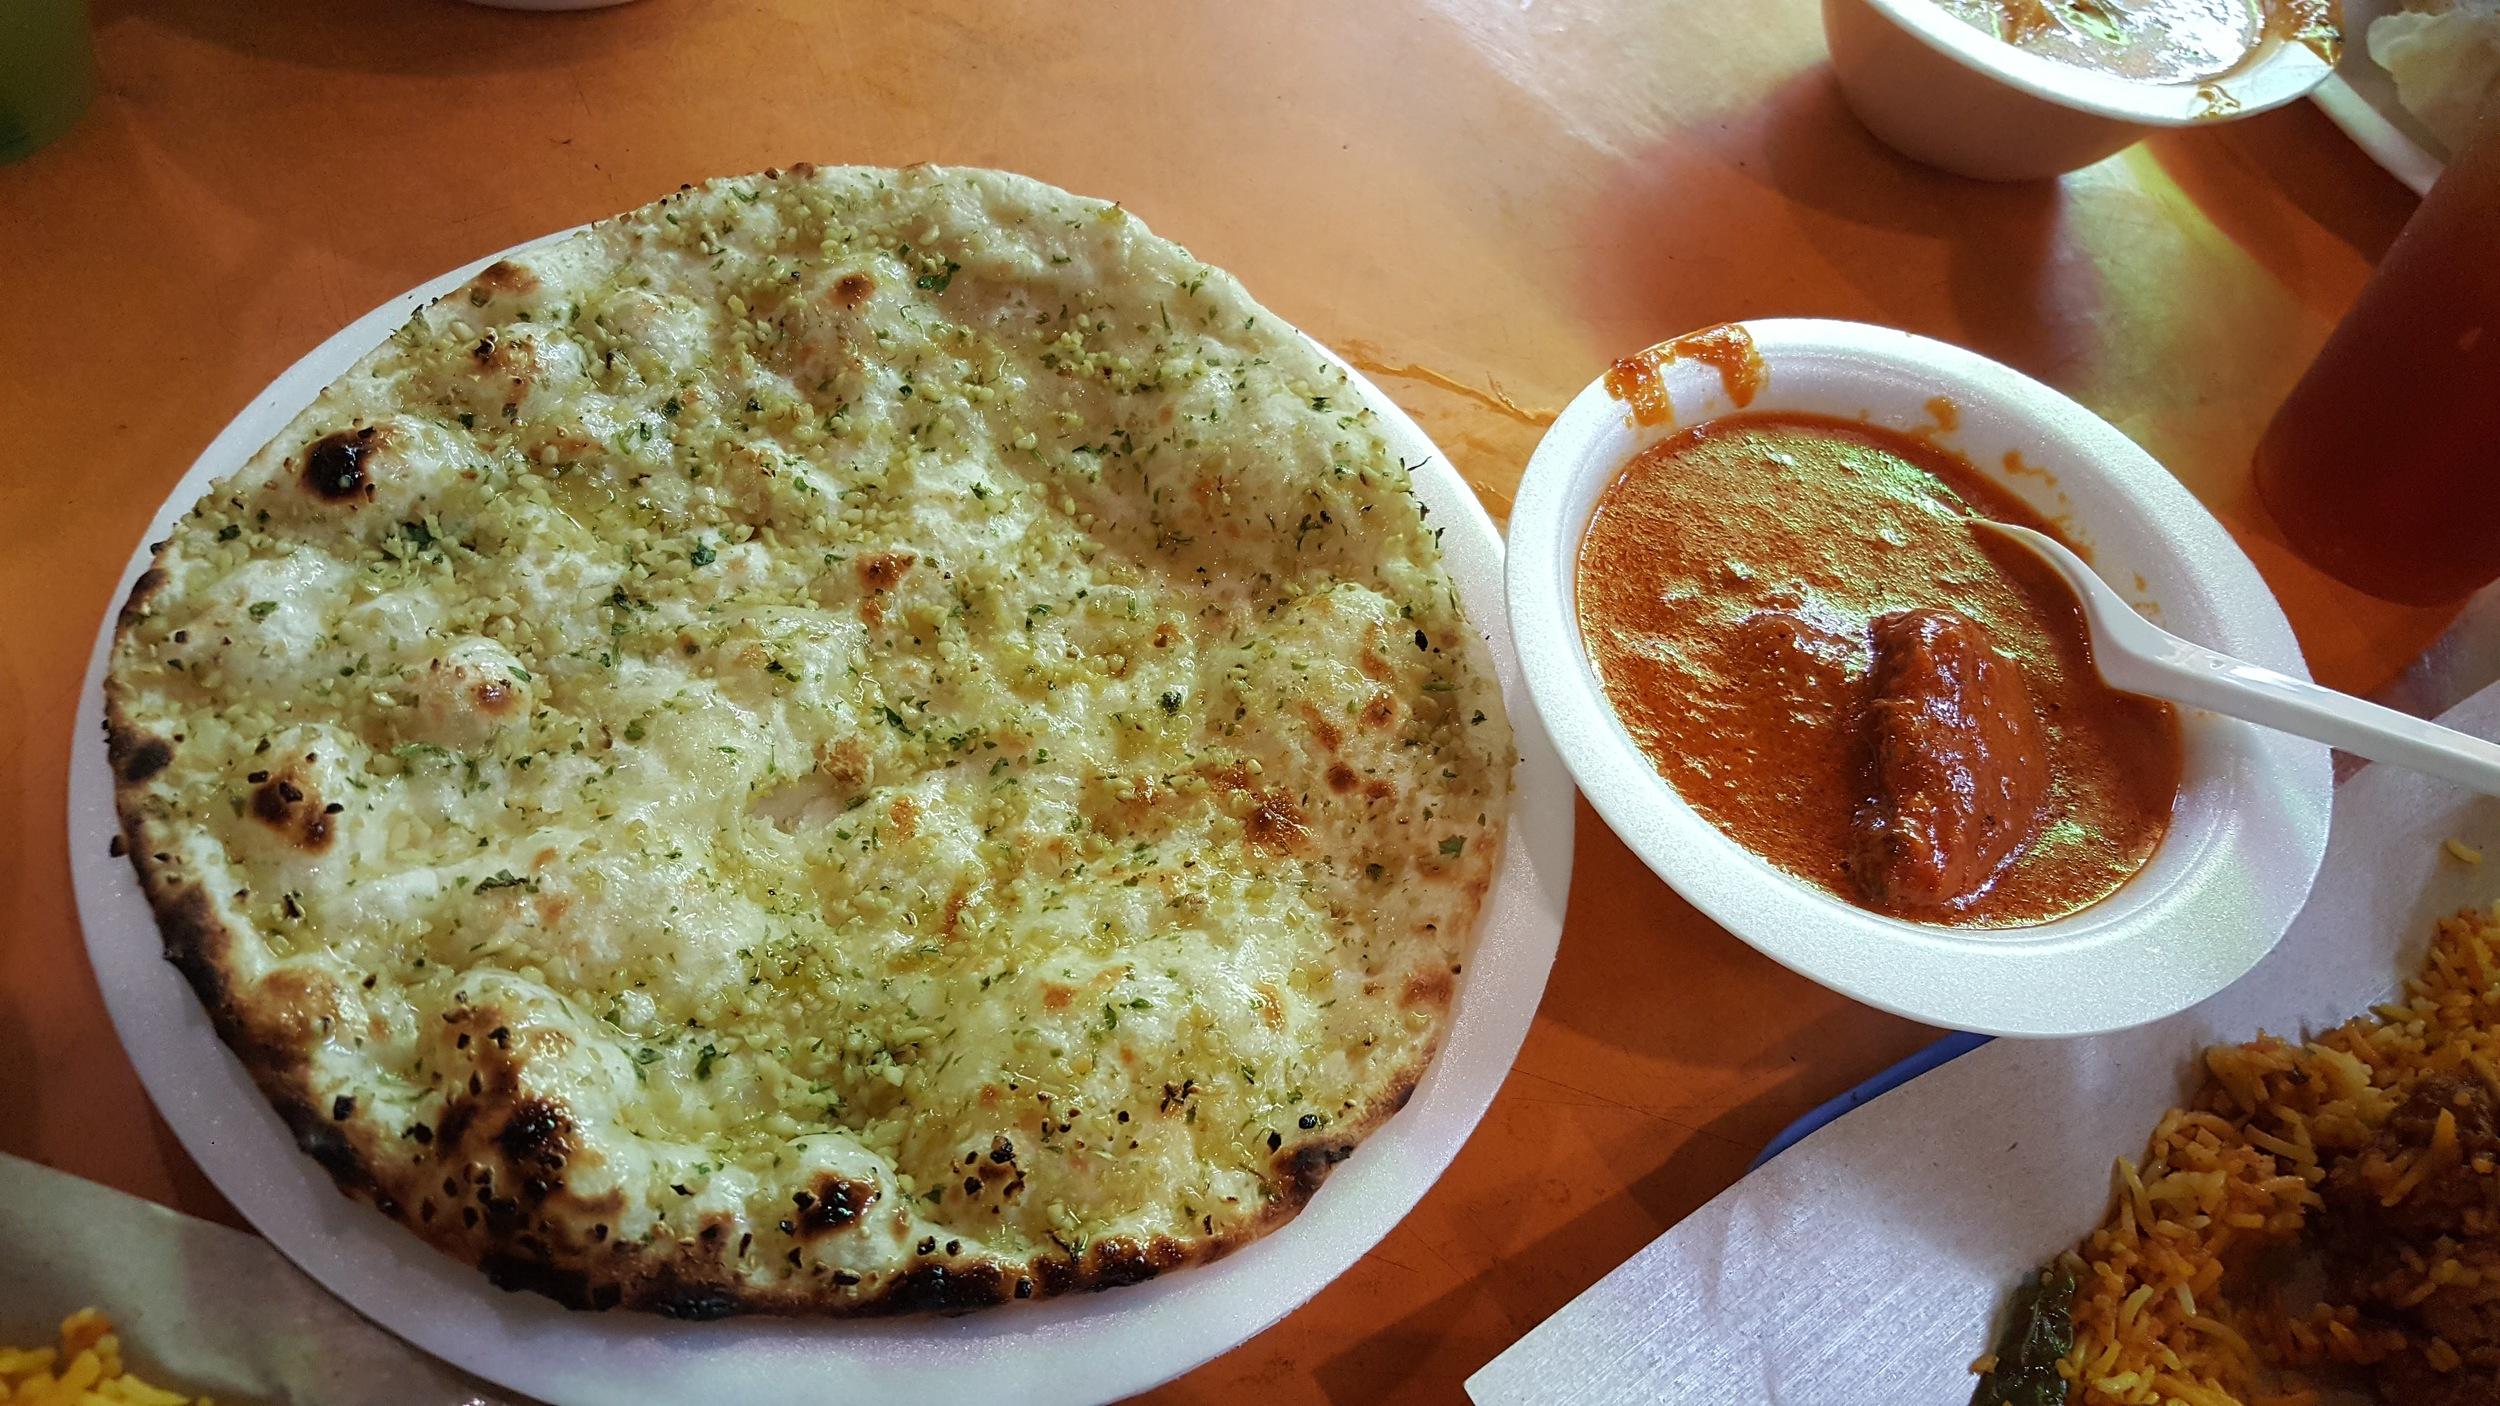 Garlic naan and butter chicken at Al-Madina food corner (Tekka center, Little India)